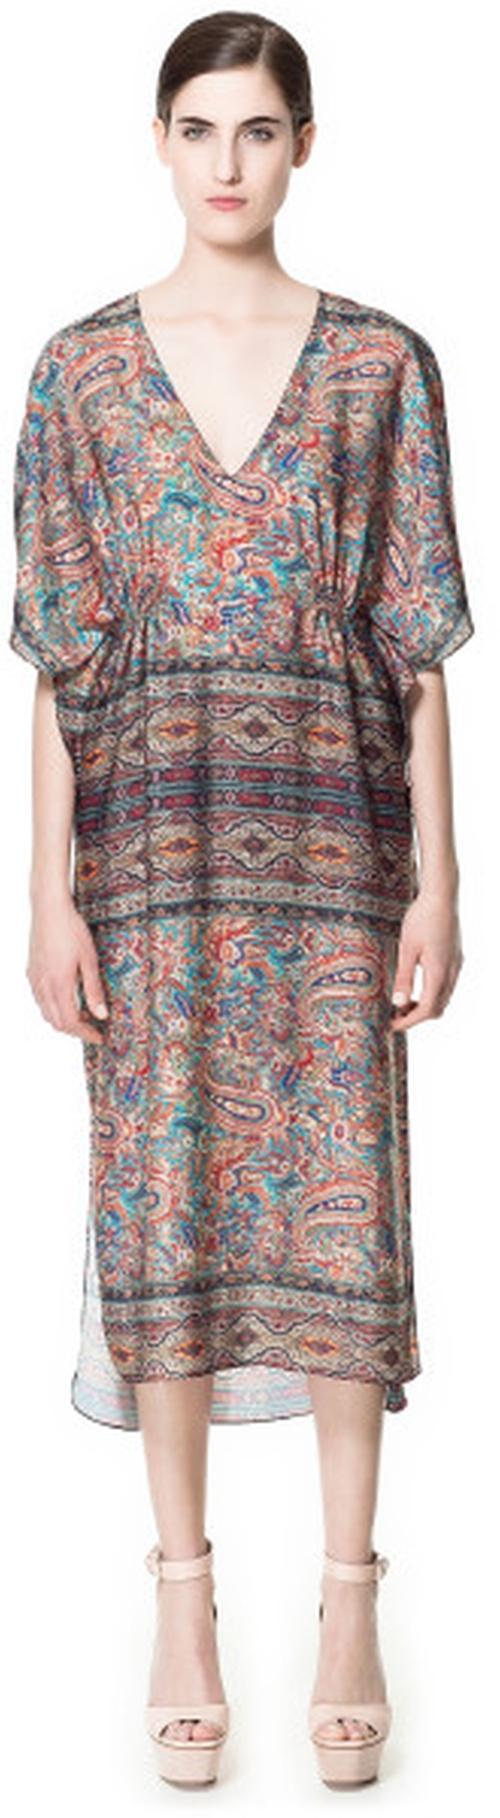 Multicolor Paisley Printed Kaftan Dress by Zara in Tammy